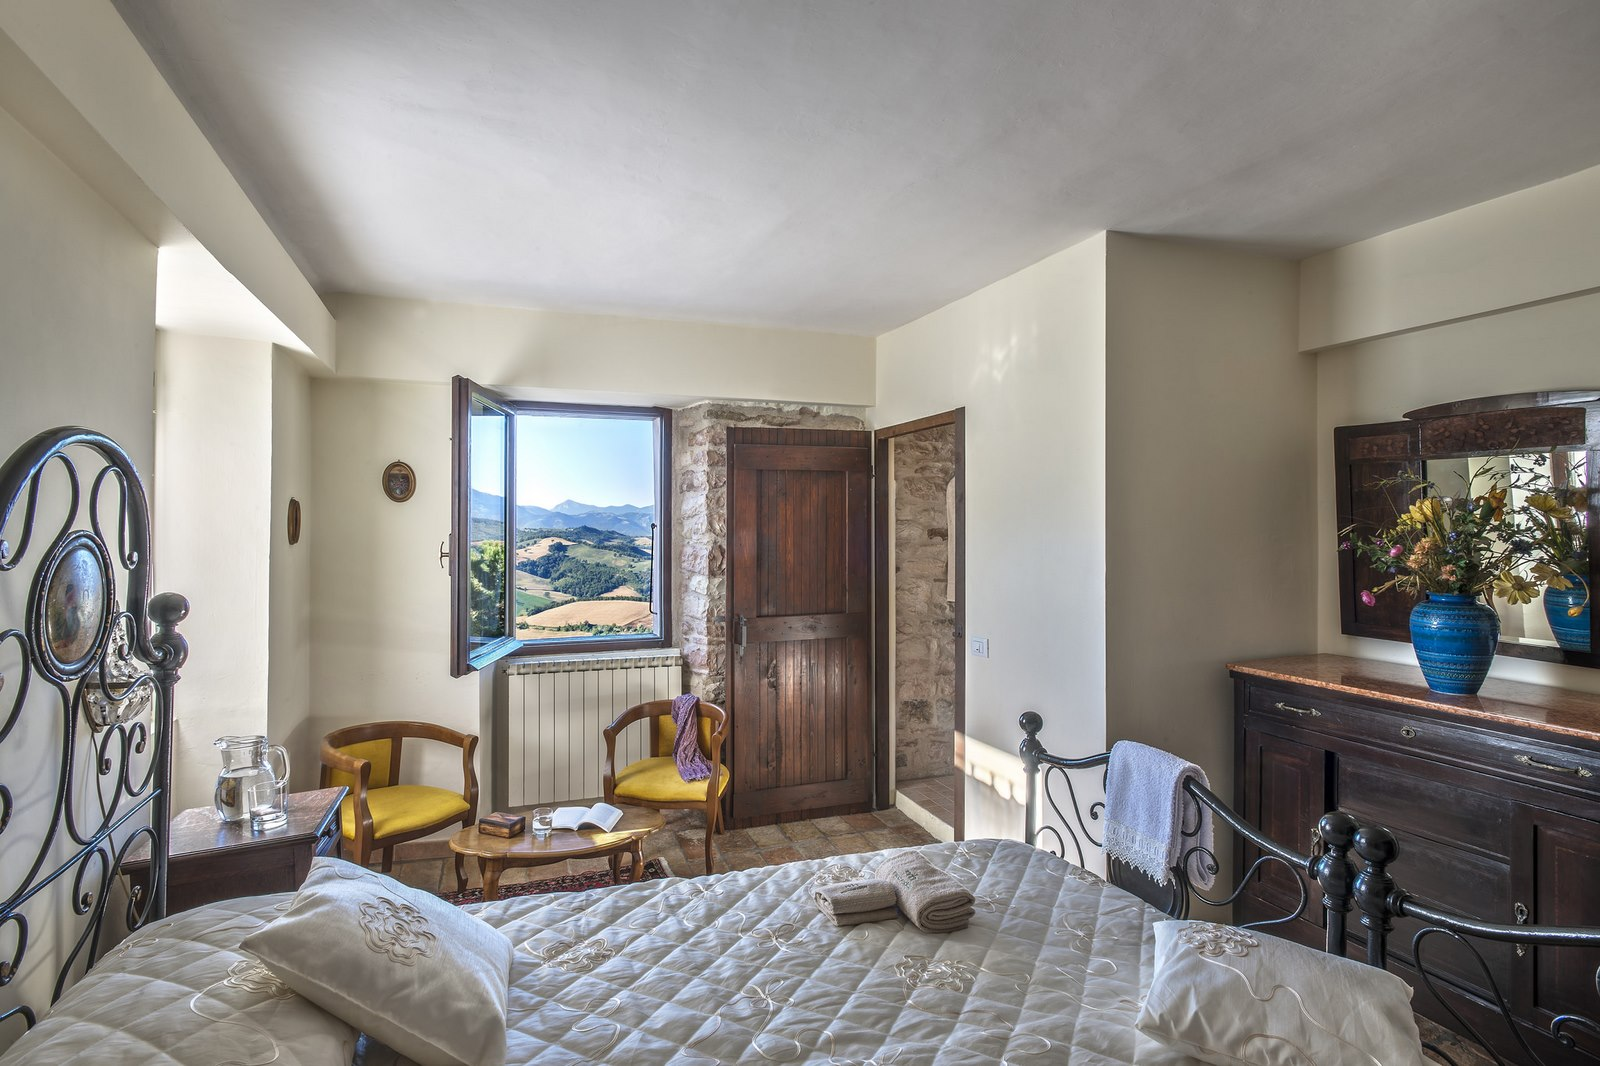 Ferienhaus La Quiete dei Re (2236092), Cagli, Pesaro und Urbino, Marken, Italien, Bild 16